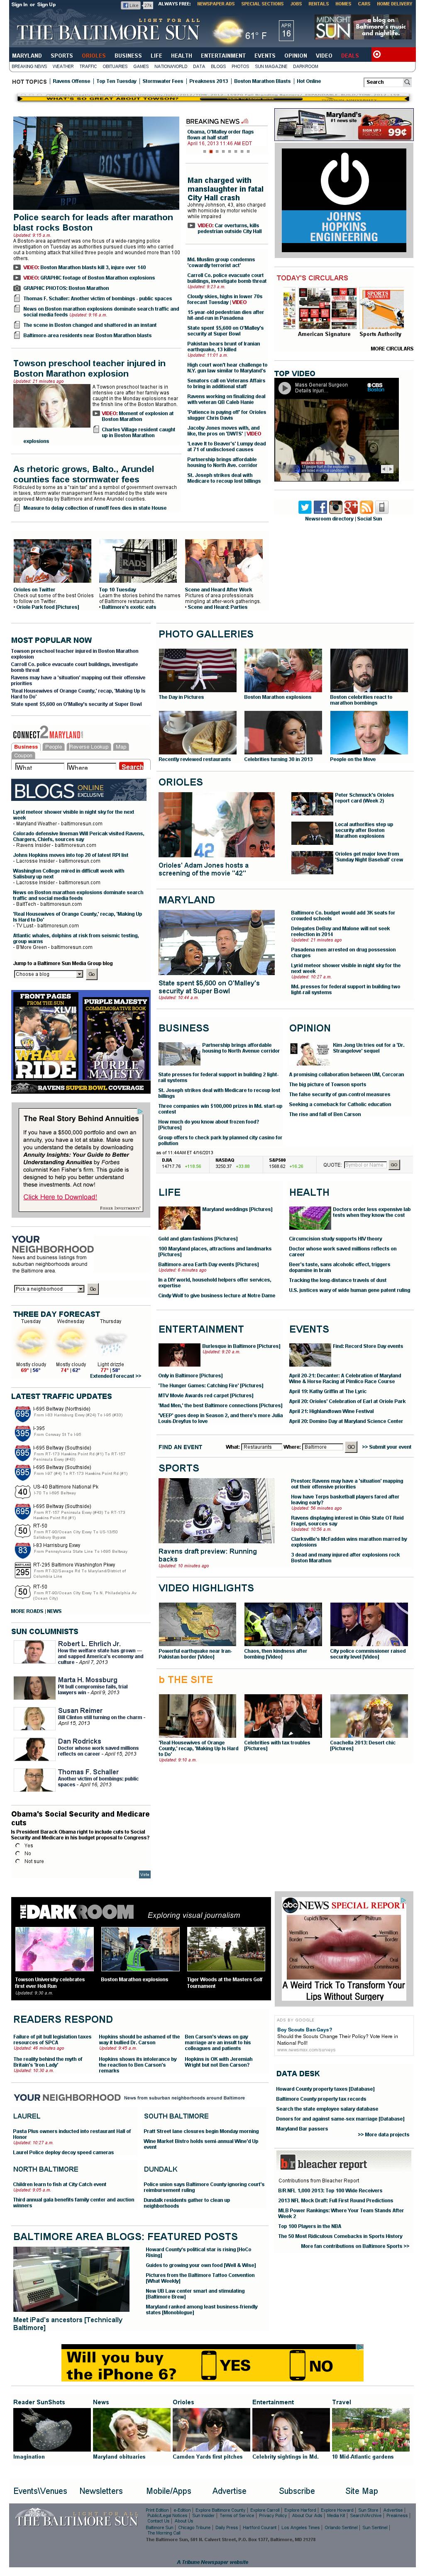 The Baltimore Sun at Tuesday April 16, 2013, 4:01 p.m. UTC